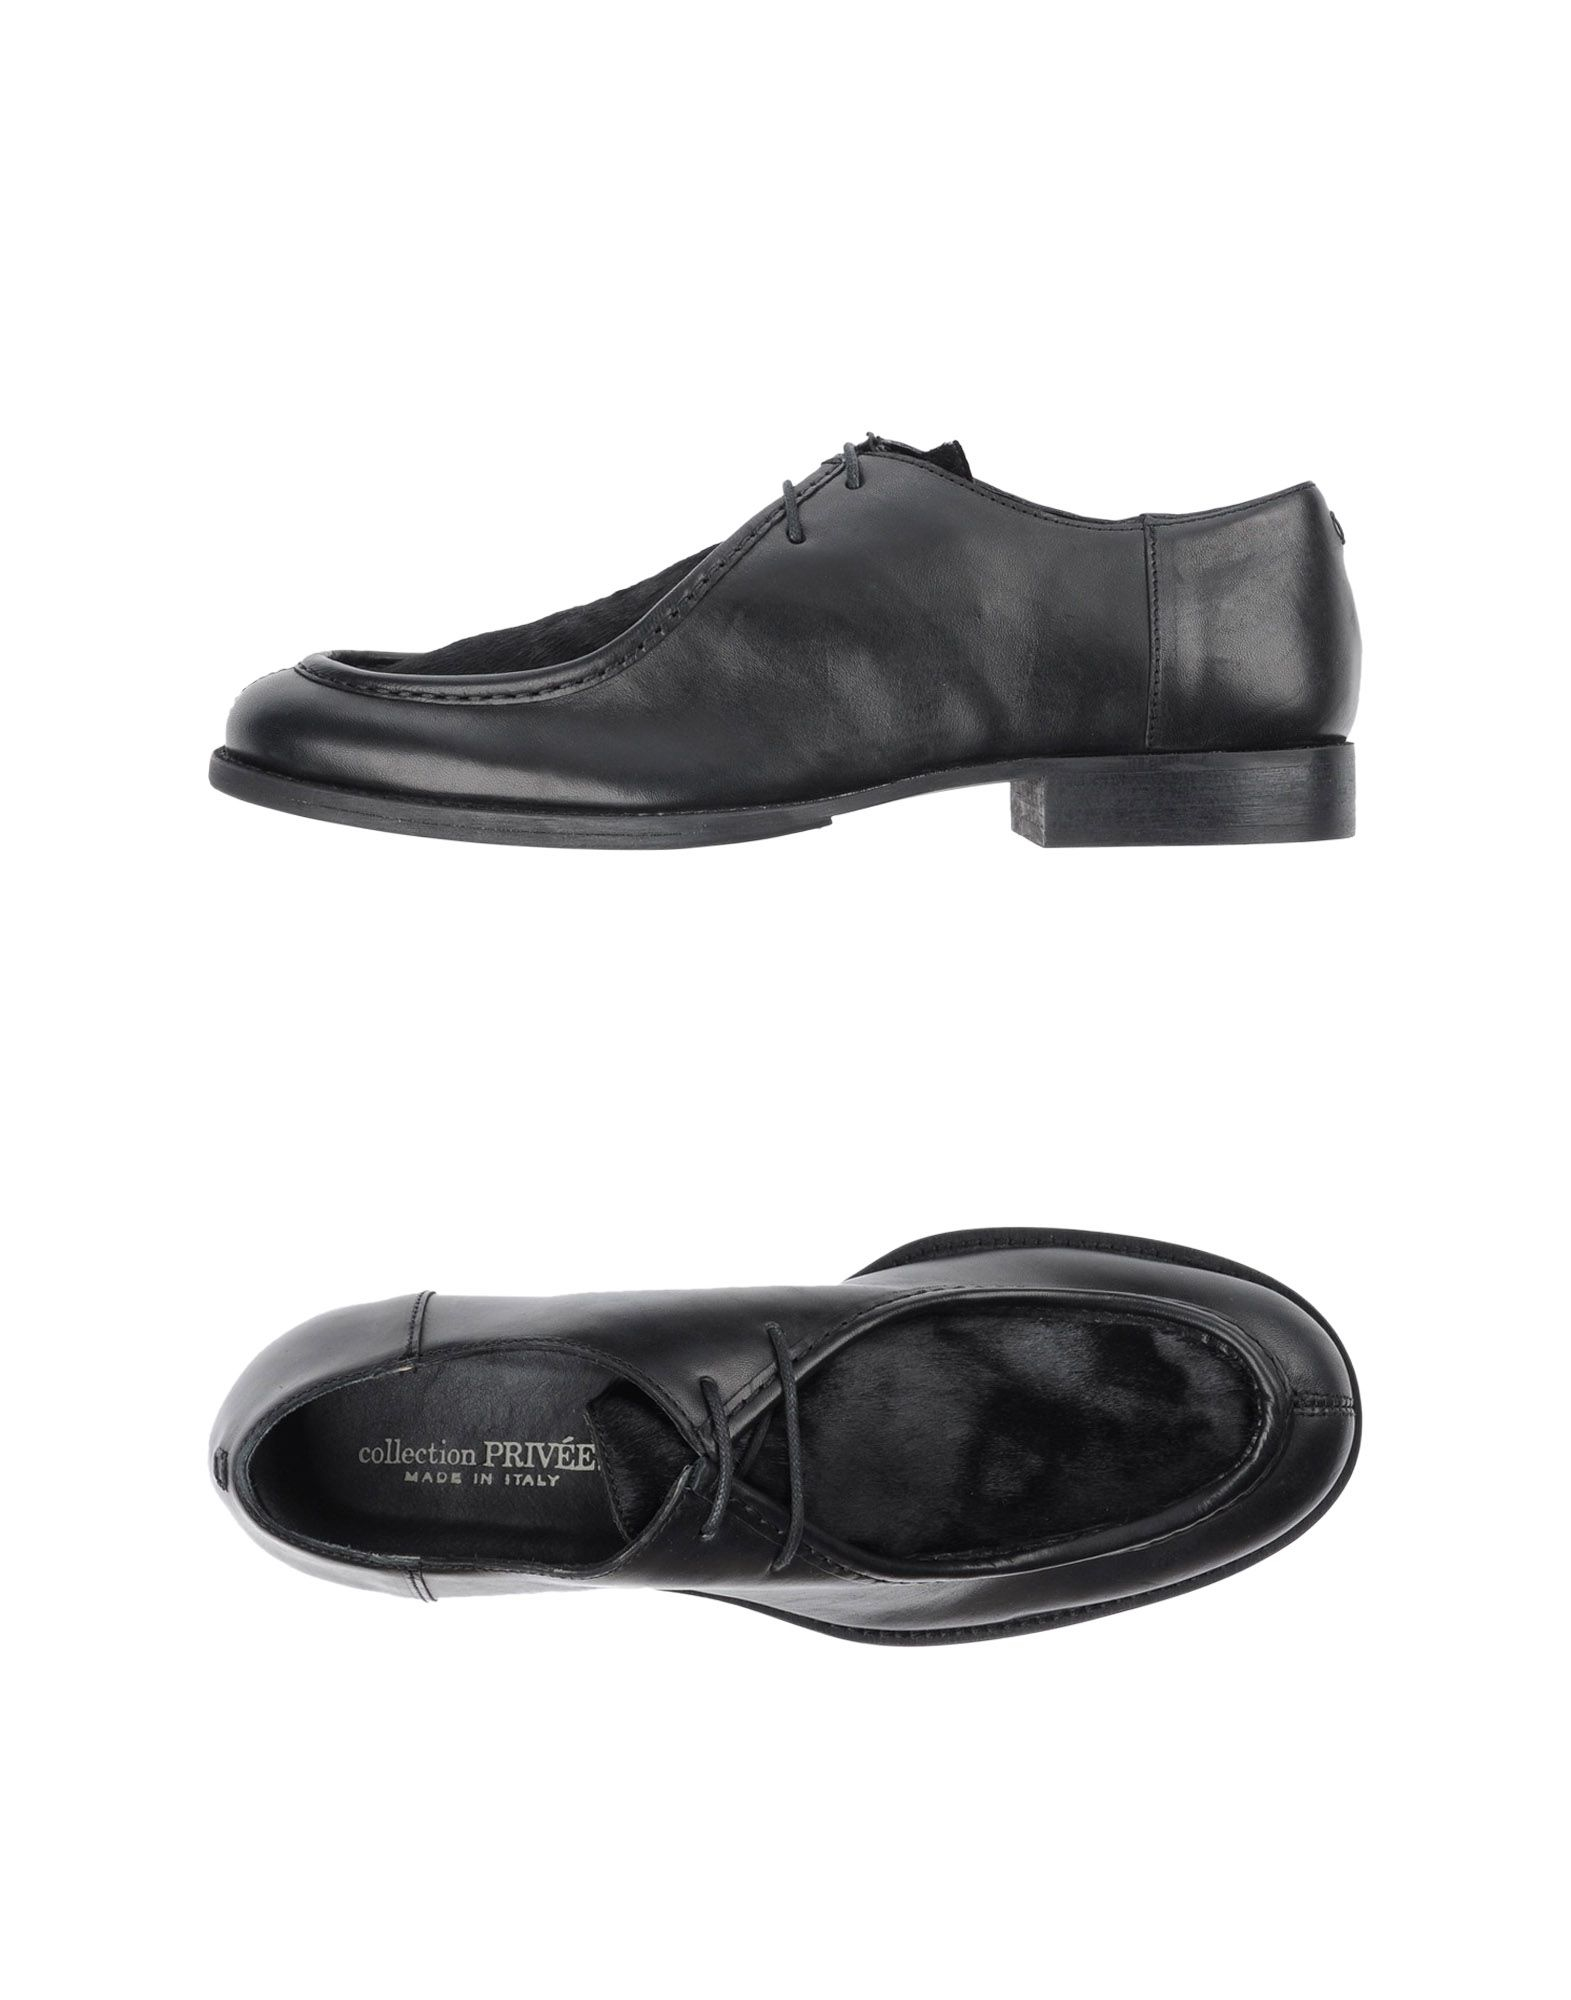 Collection Privēe? Collection Privee? Lace-up Shoe Chaussures À Lacets 82YQtO2